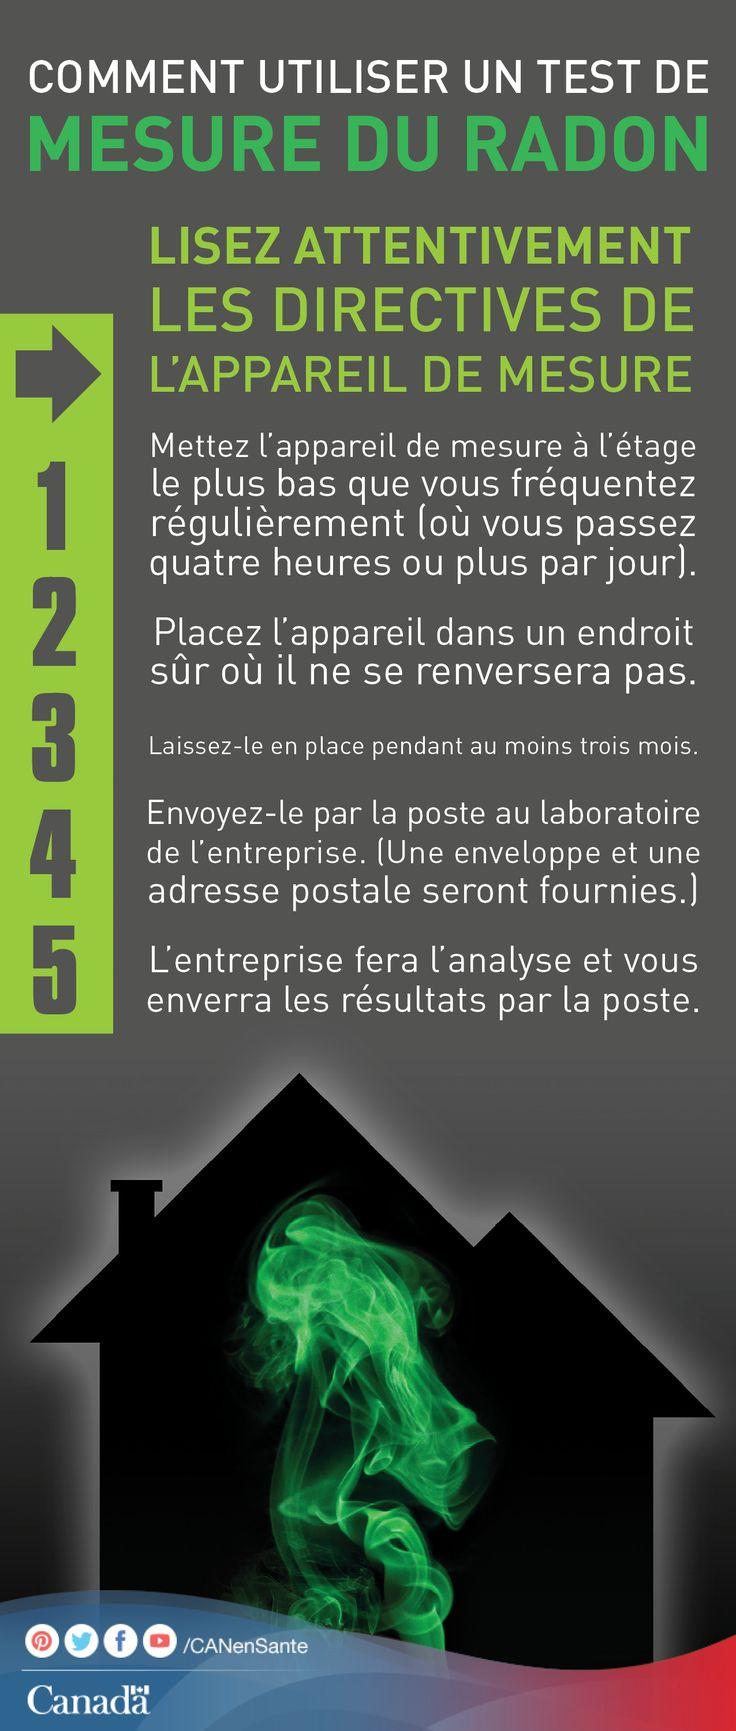 22 best images about radon on pinterest canada home and bayern. Black Bedroom Furniture Sets. Home Design Ideas